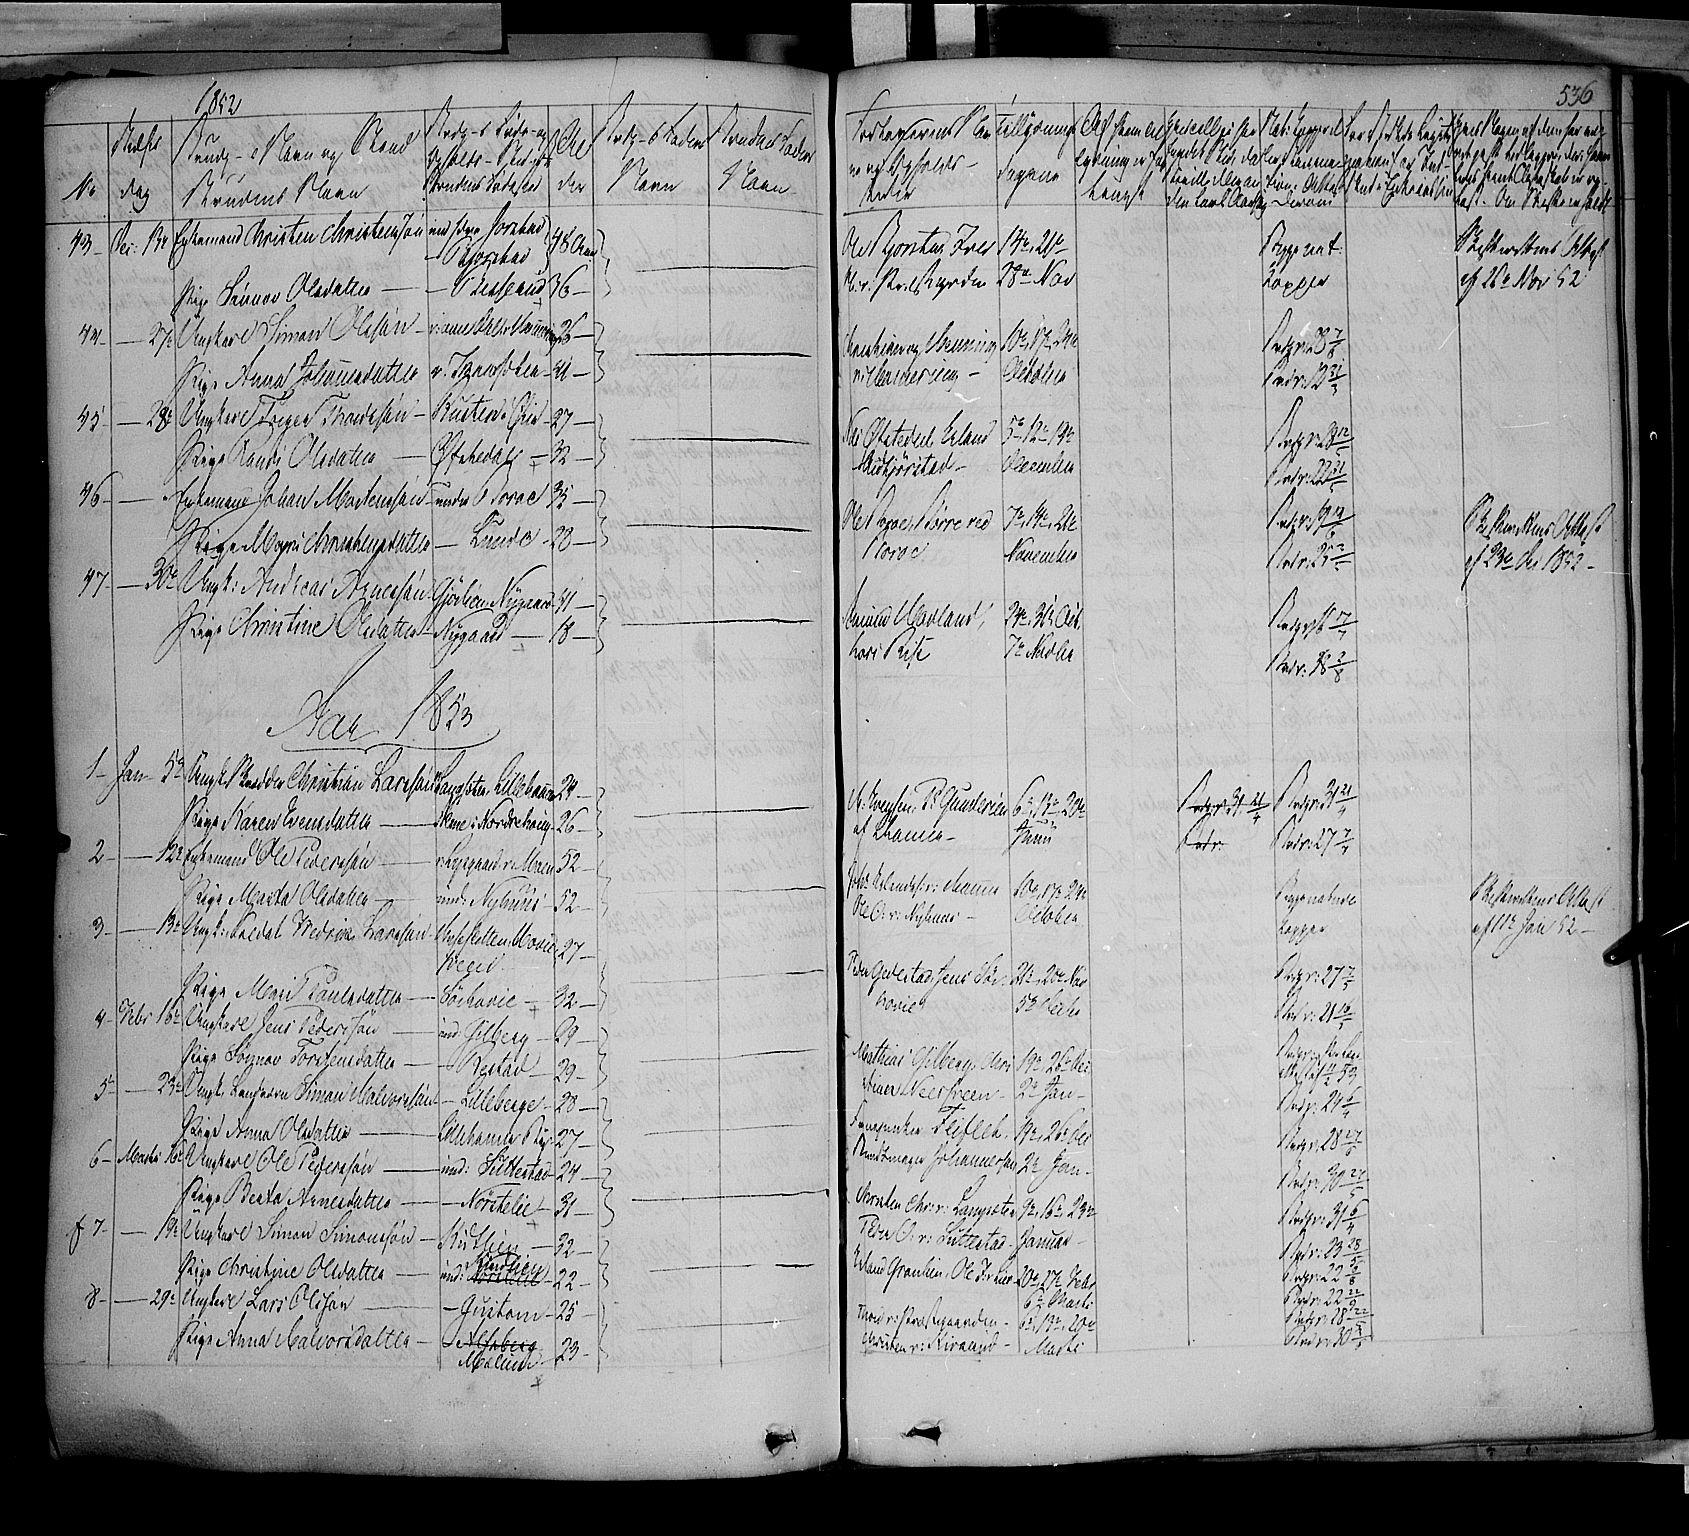 SAH, Fåberg prestekontor, Ministerialbok nr. 5, 1836-1854, s. 535-536